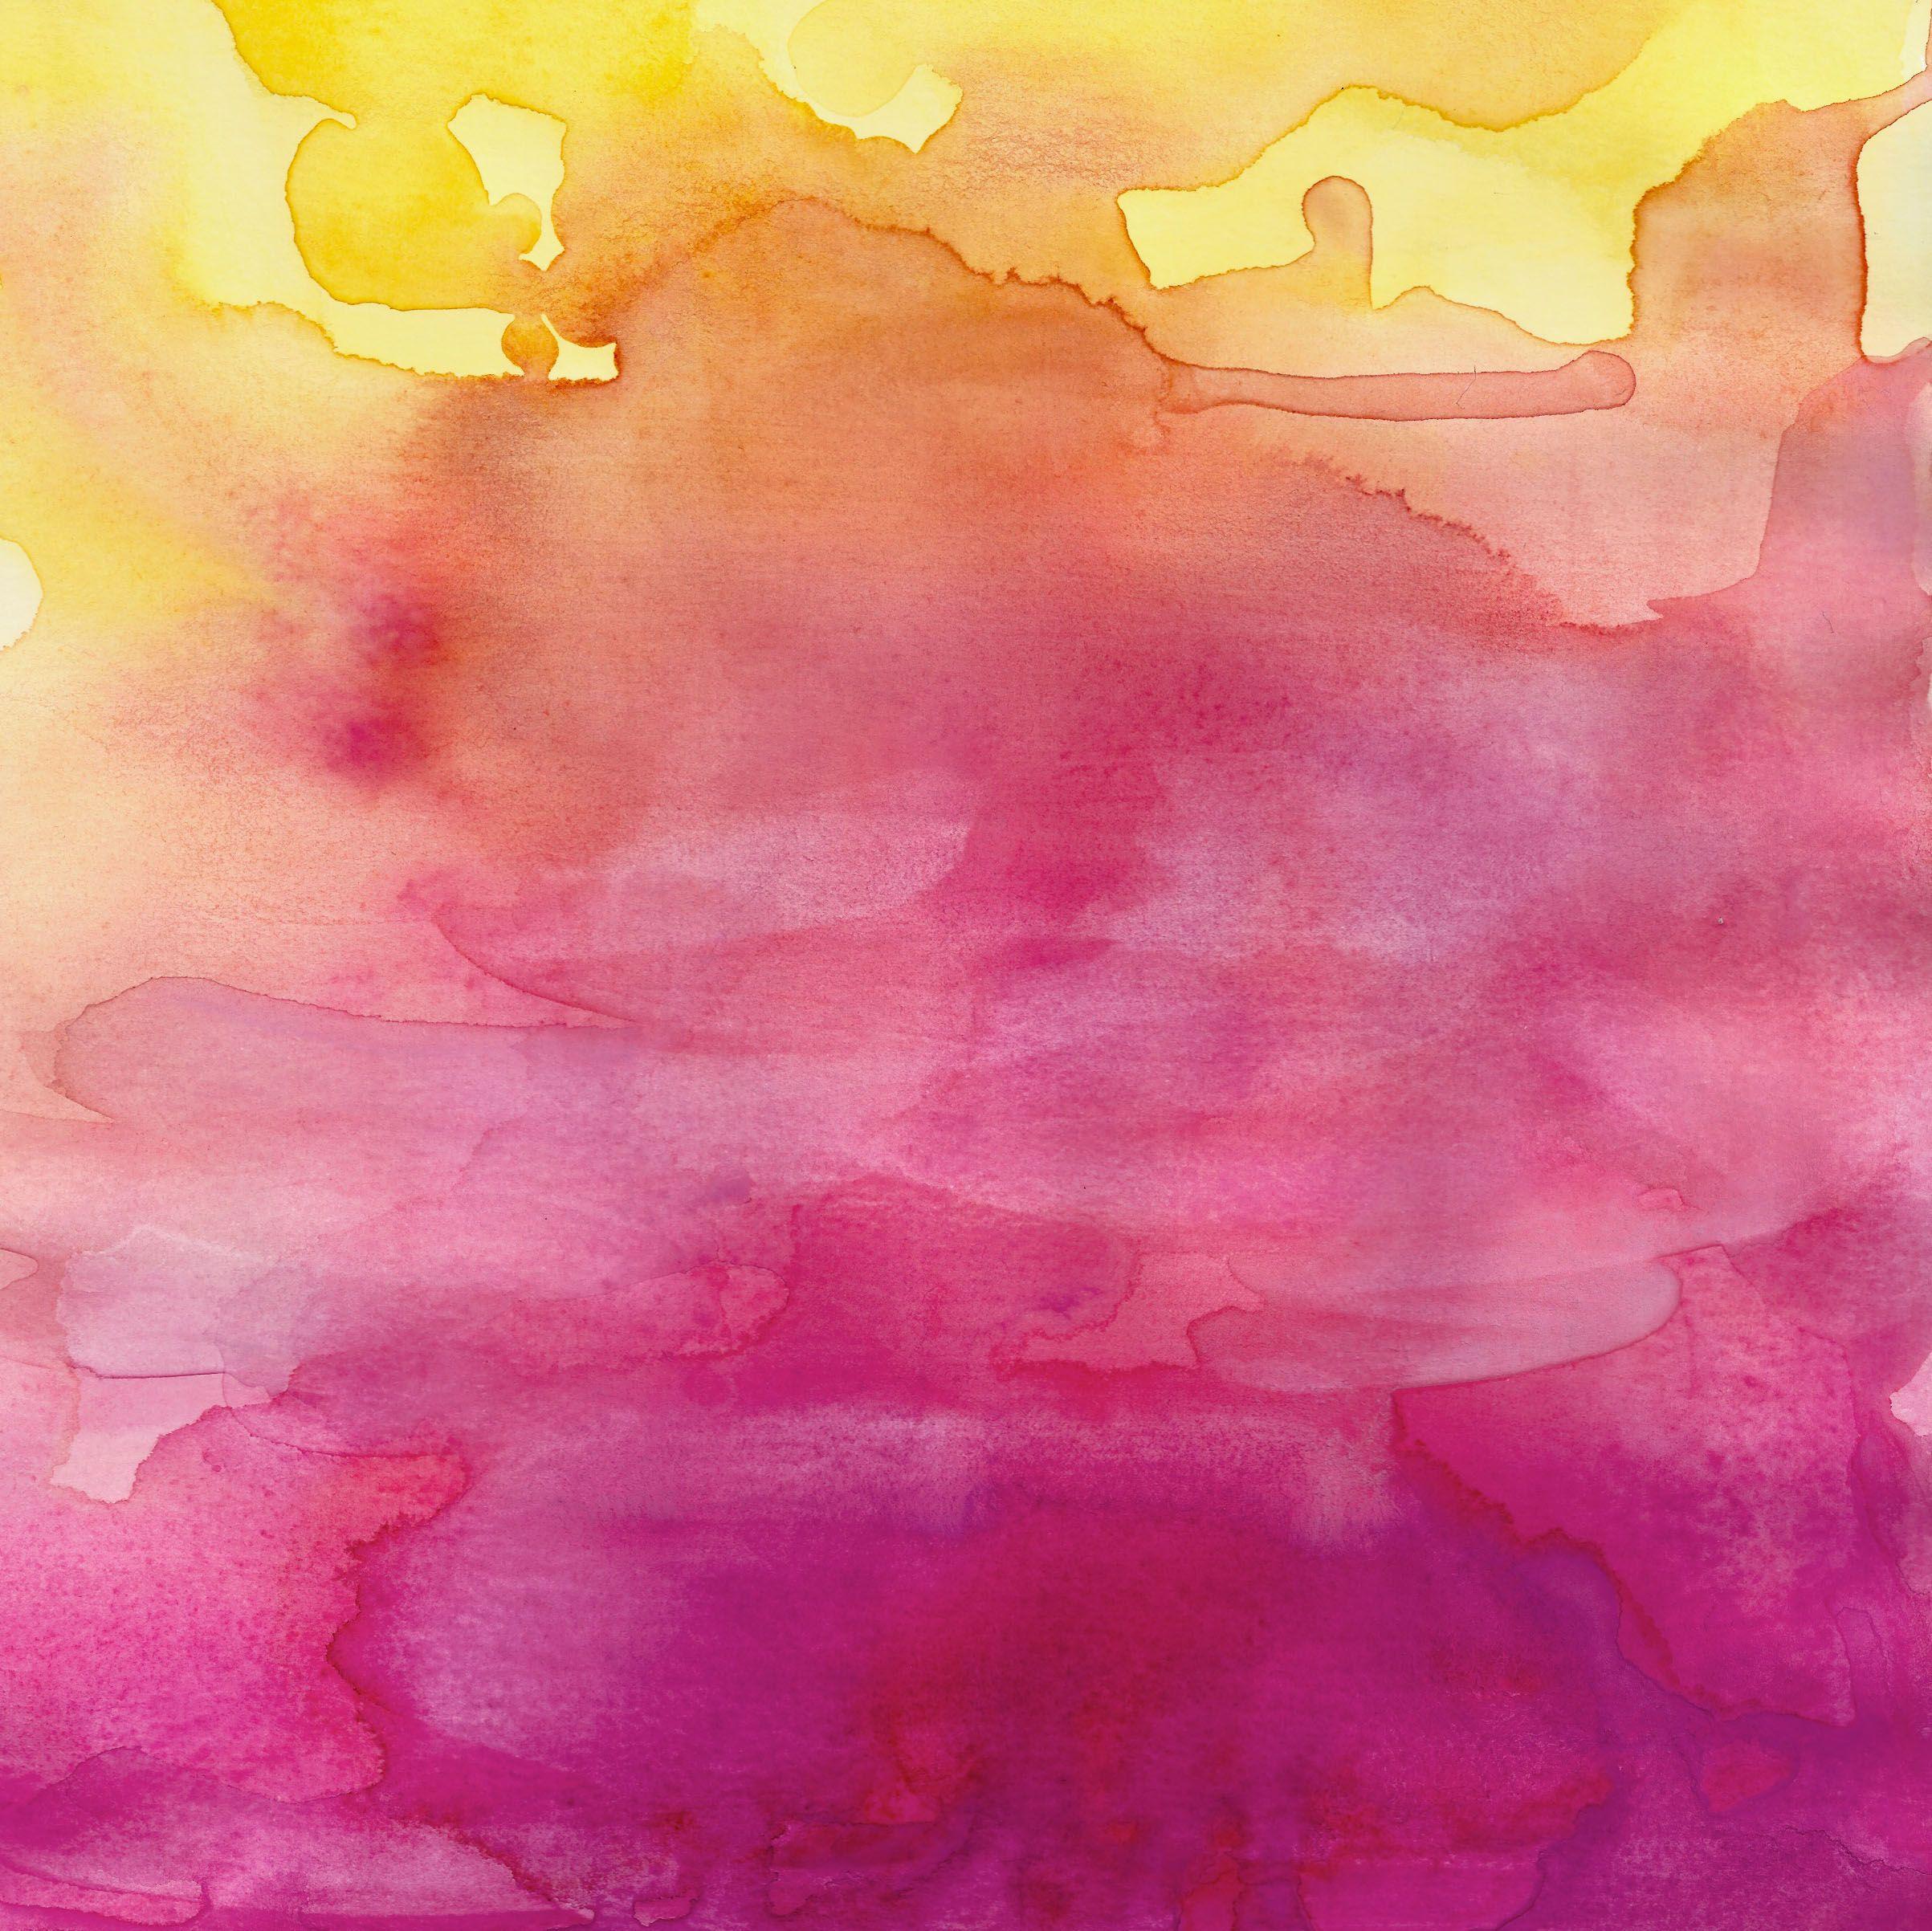 Watercolor Textures Panttern 2 Watercolor texture